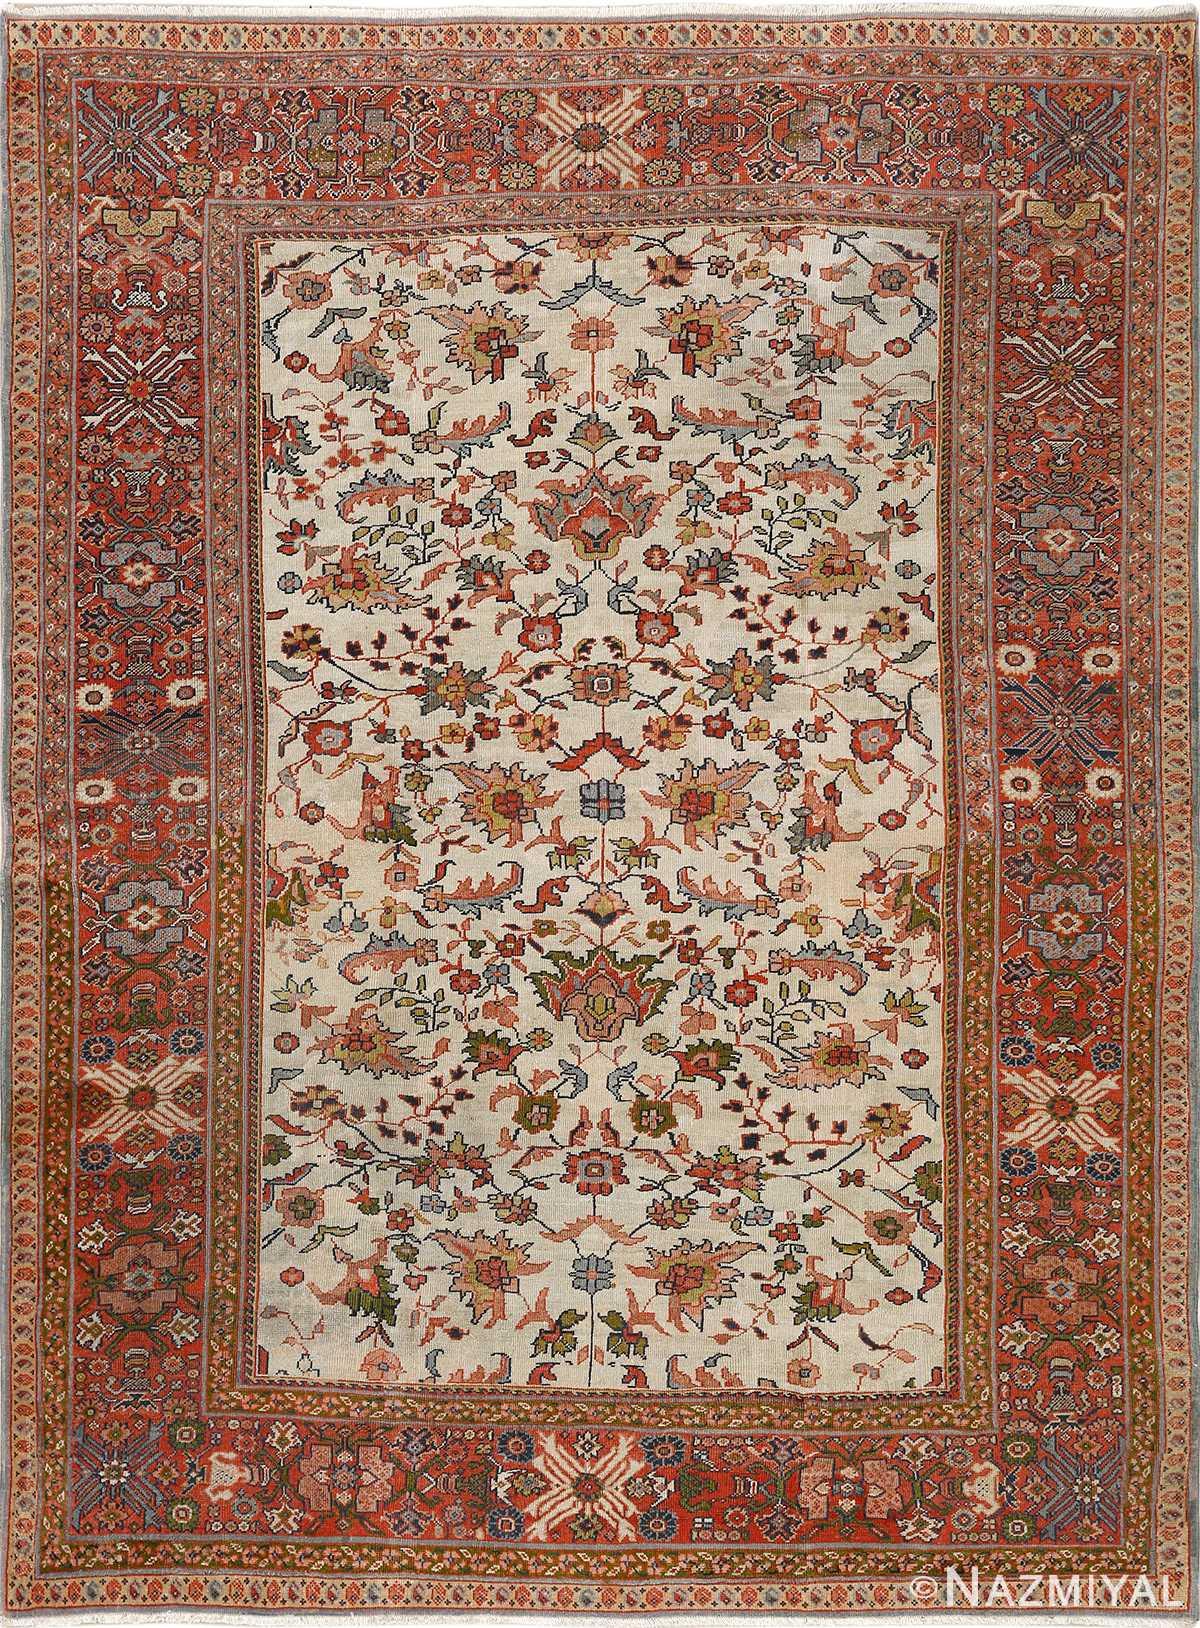 antique ivory background sultanabad persian rug 51101 Nazmiyal